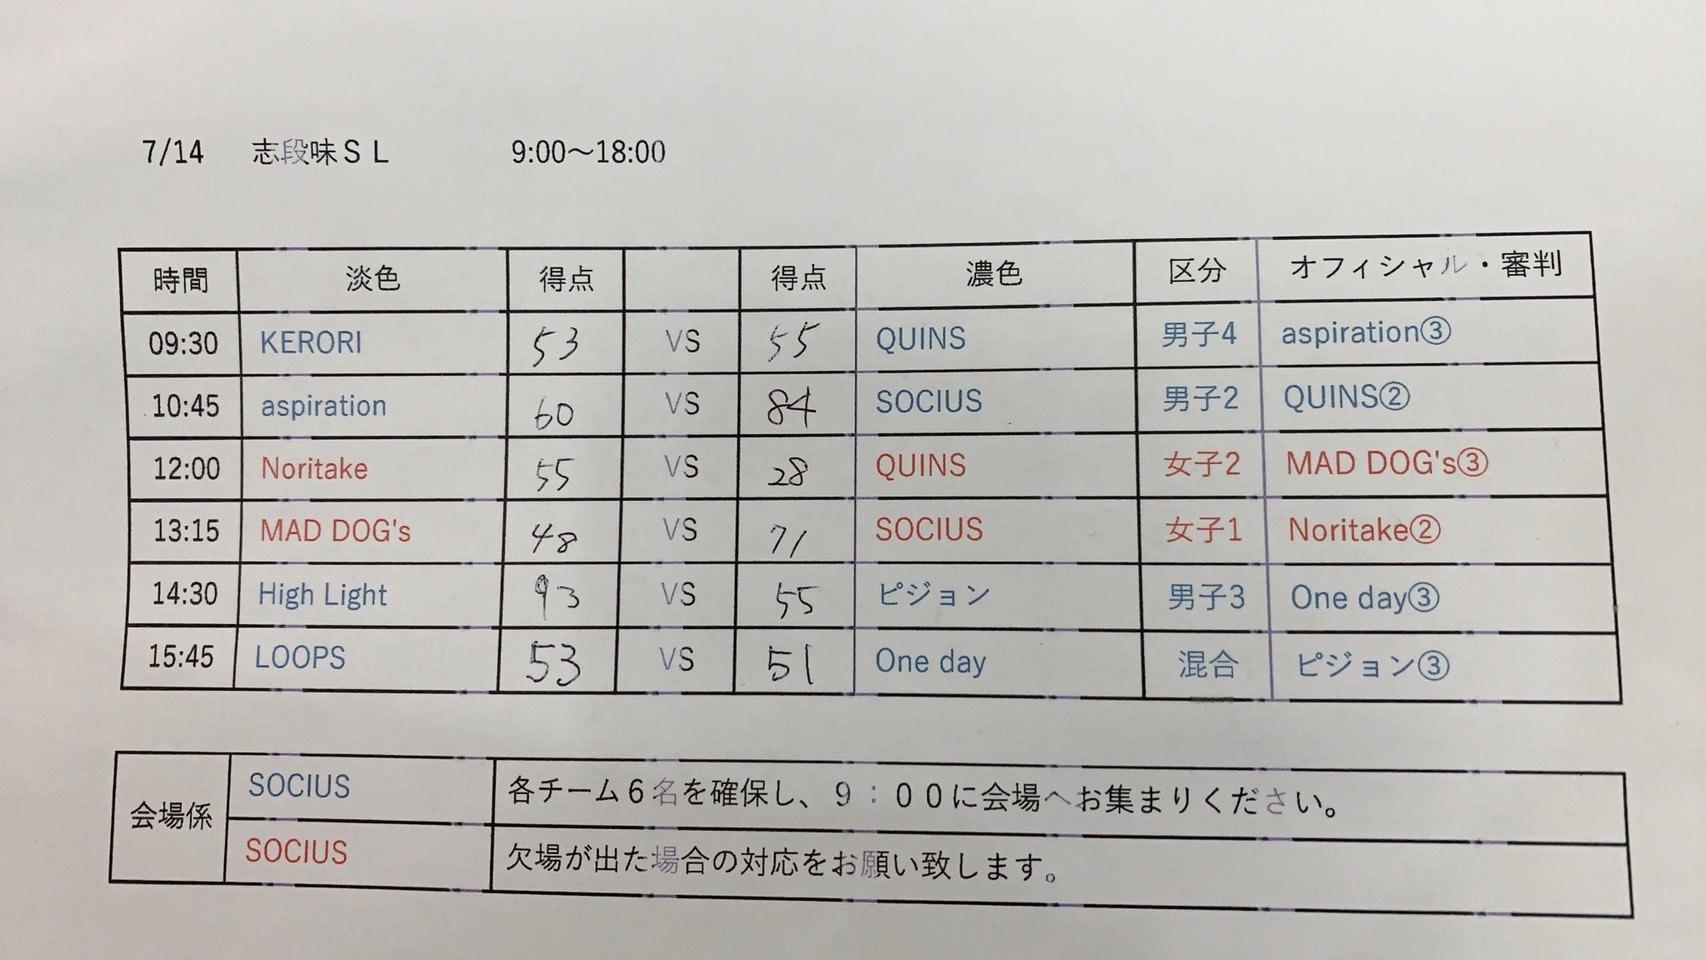 4D0B544D-881D-4438-97C1-F36F4D6BB856.jpeg